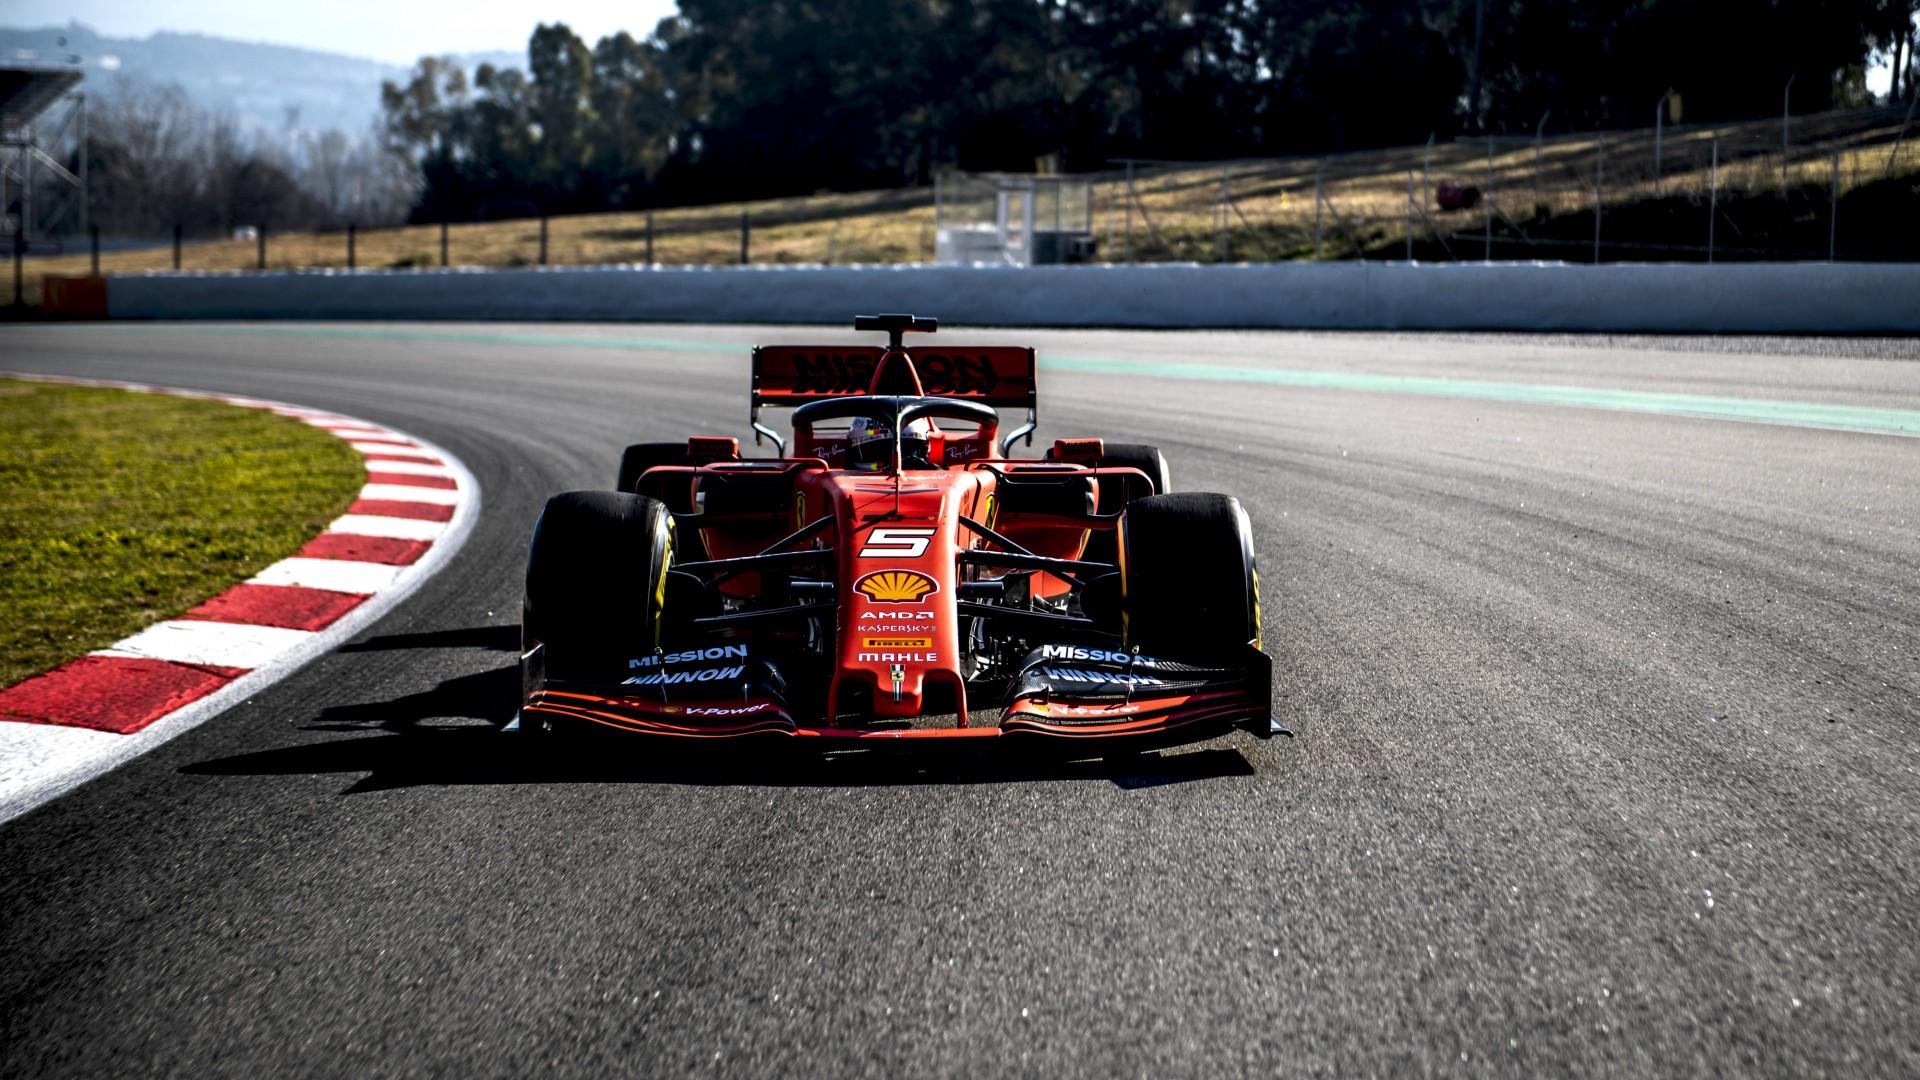 Ferrari Sf90 Formula 1 2019 5k 2 Wallpaper